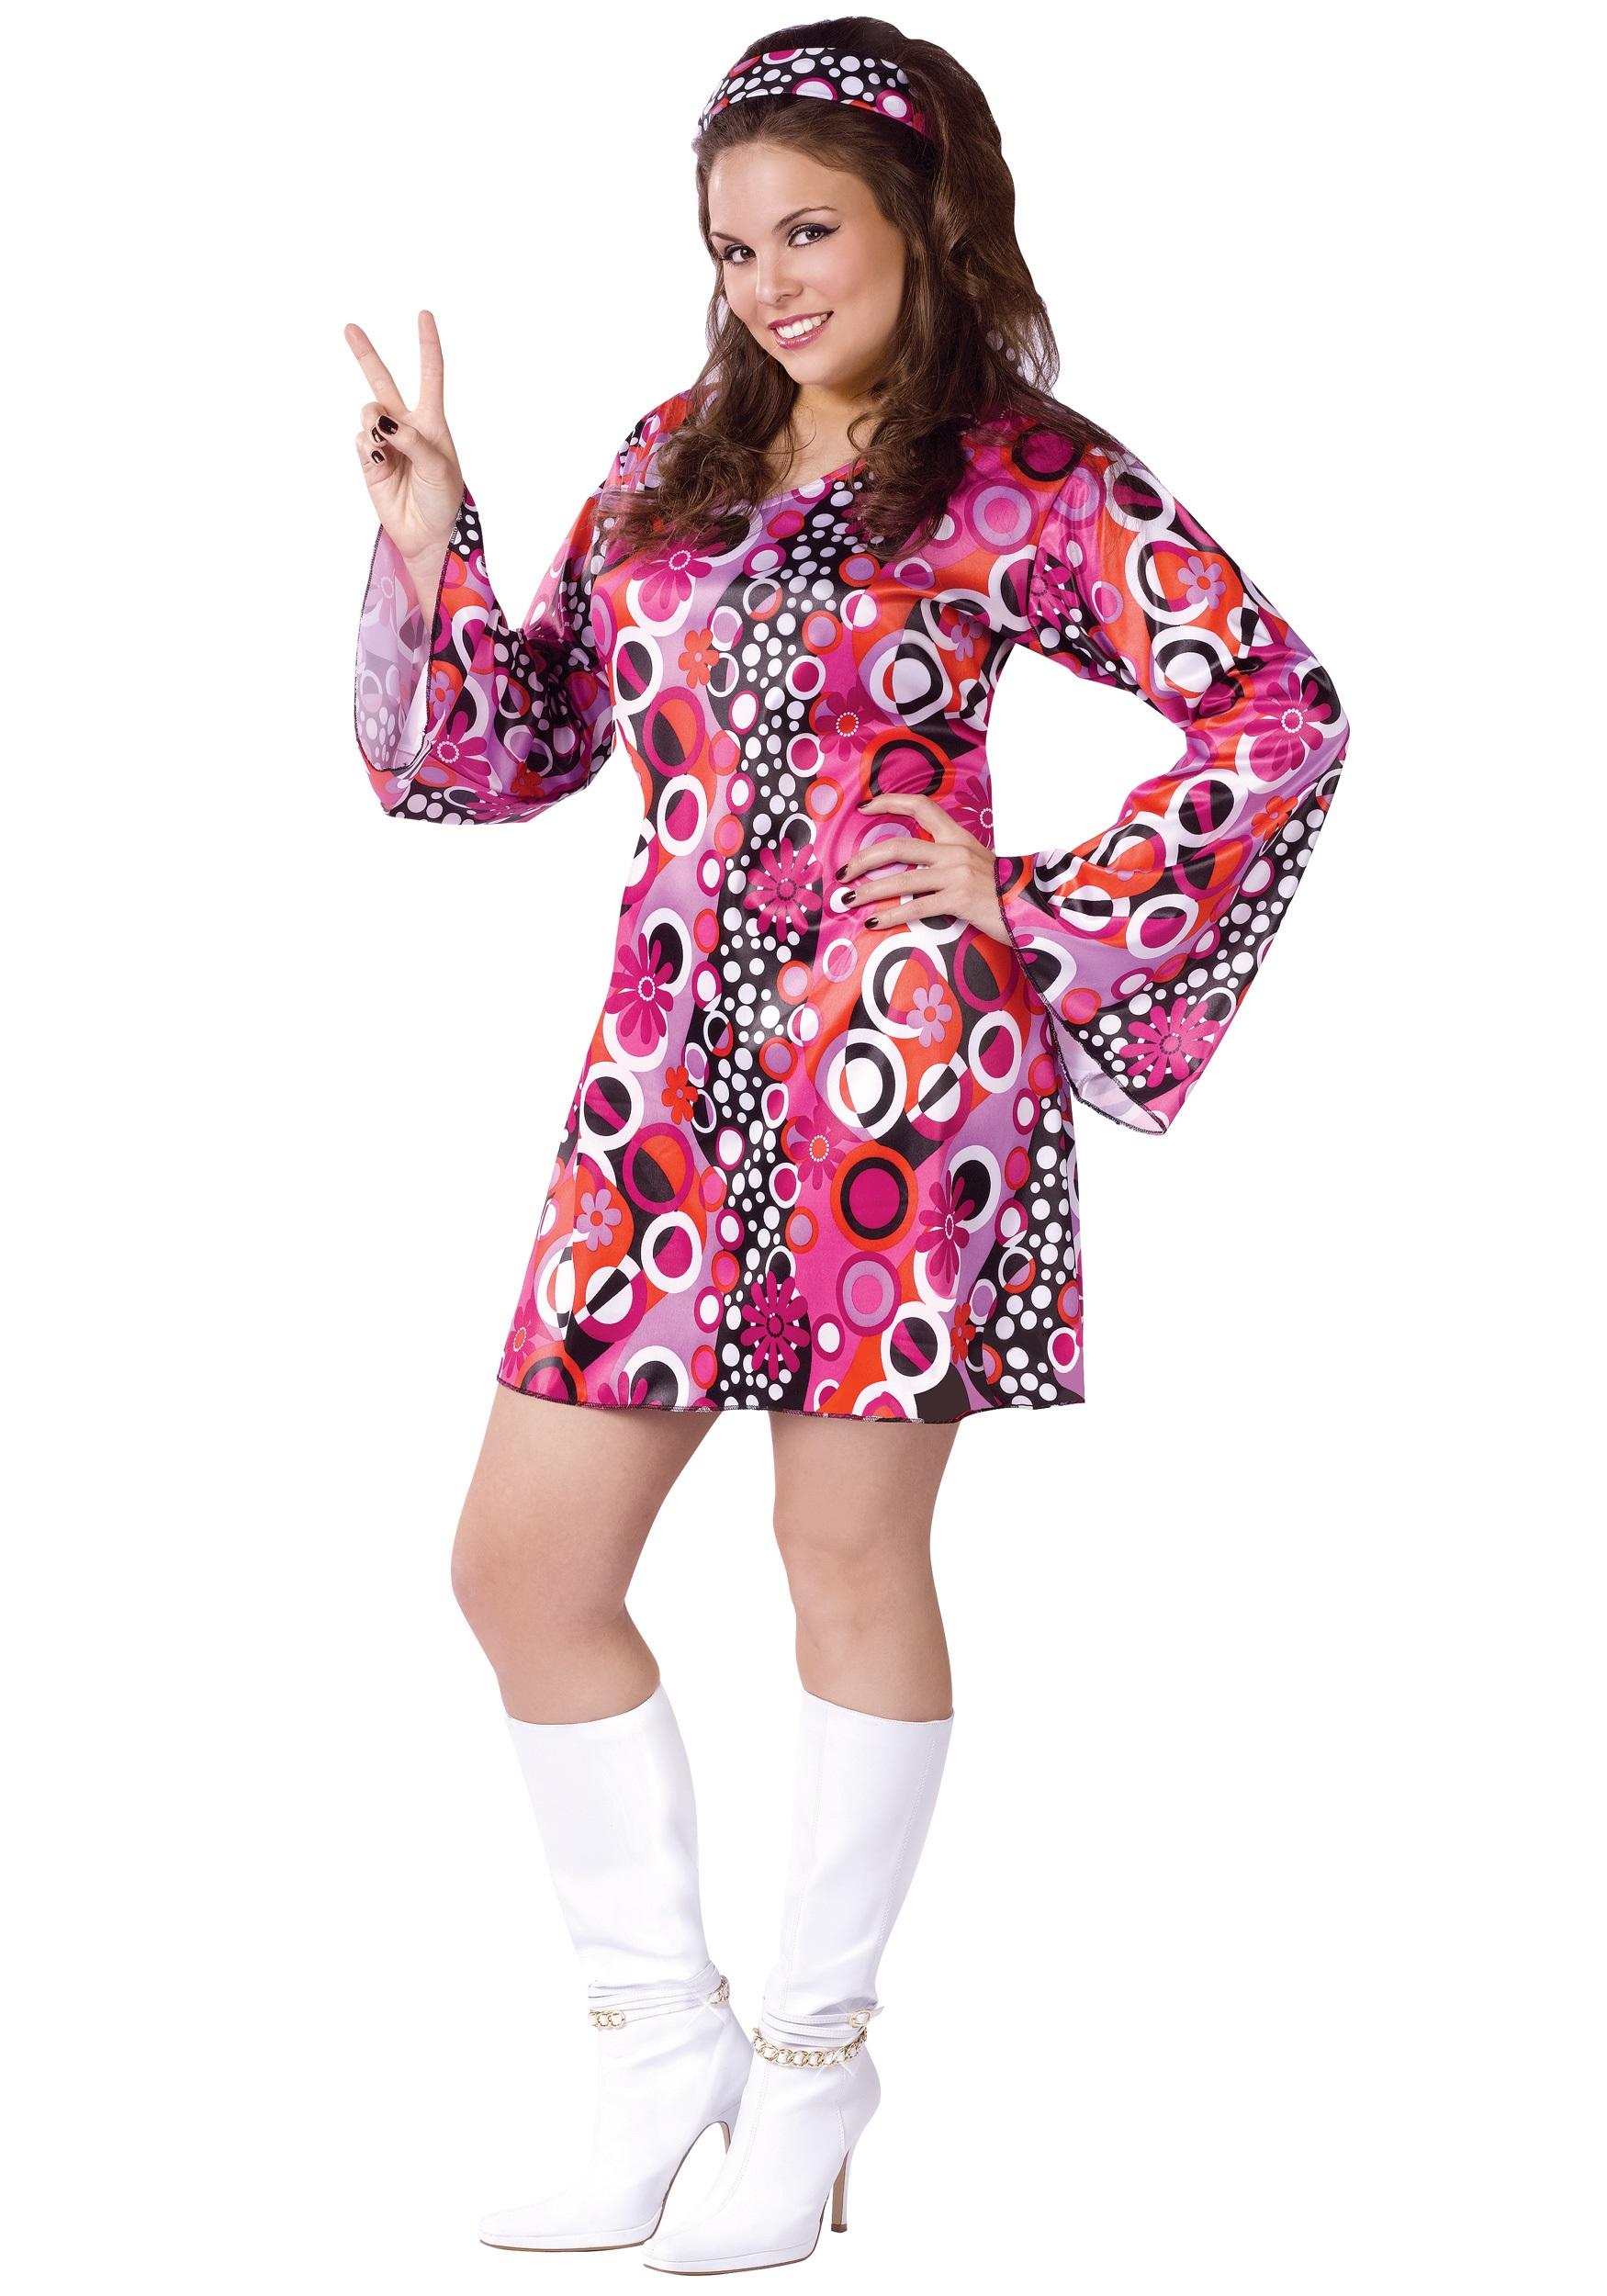 Feelin' Groovy Plus Size Dress Costume | Vintage 70s Dress